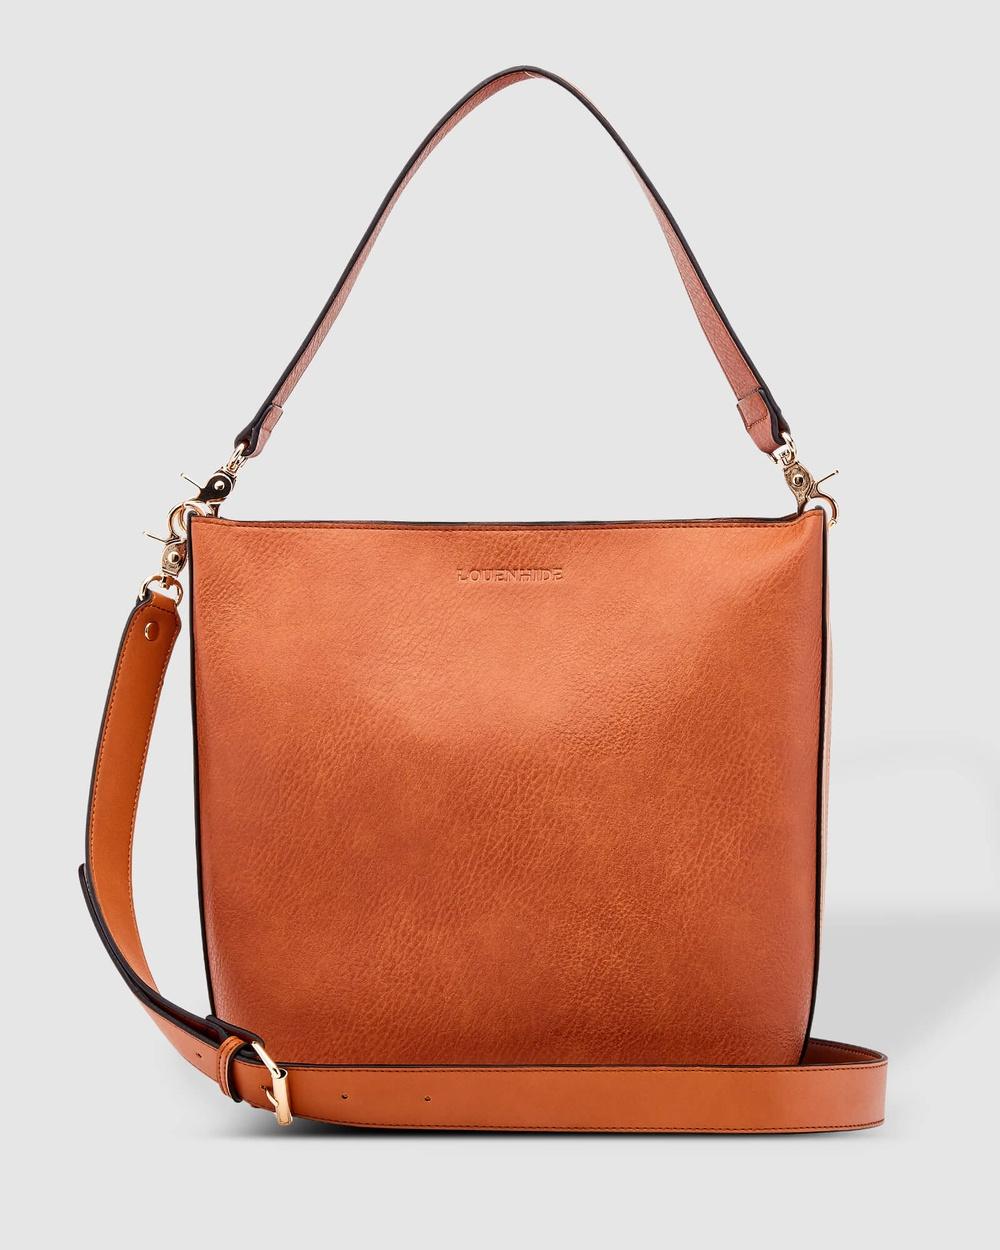 Louenhide Charlie Maxi Bag Handbags Tan